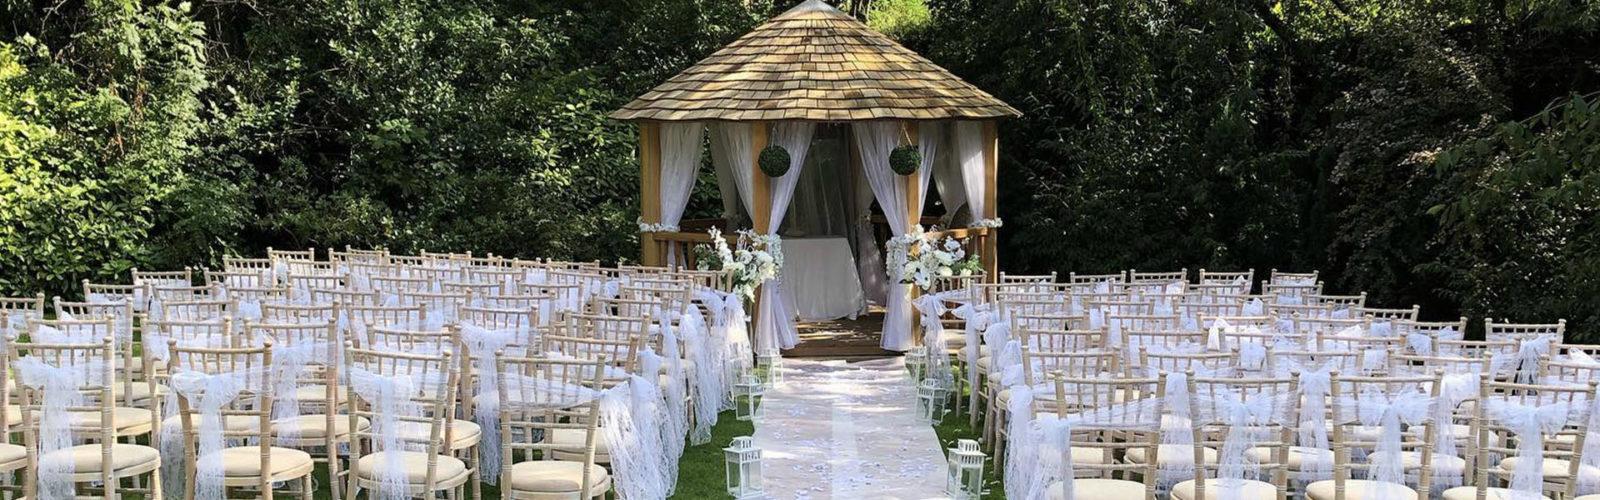 Weddings at Mosborough Hall Hotel Vine Hotel Management